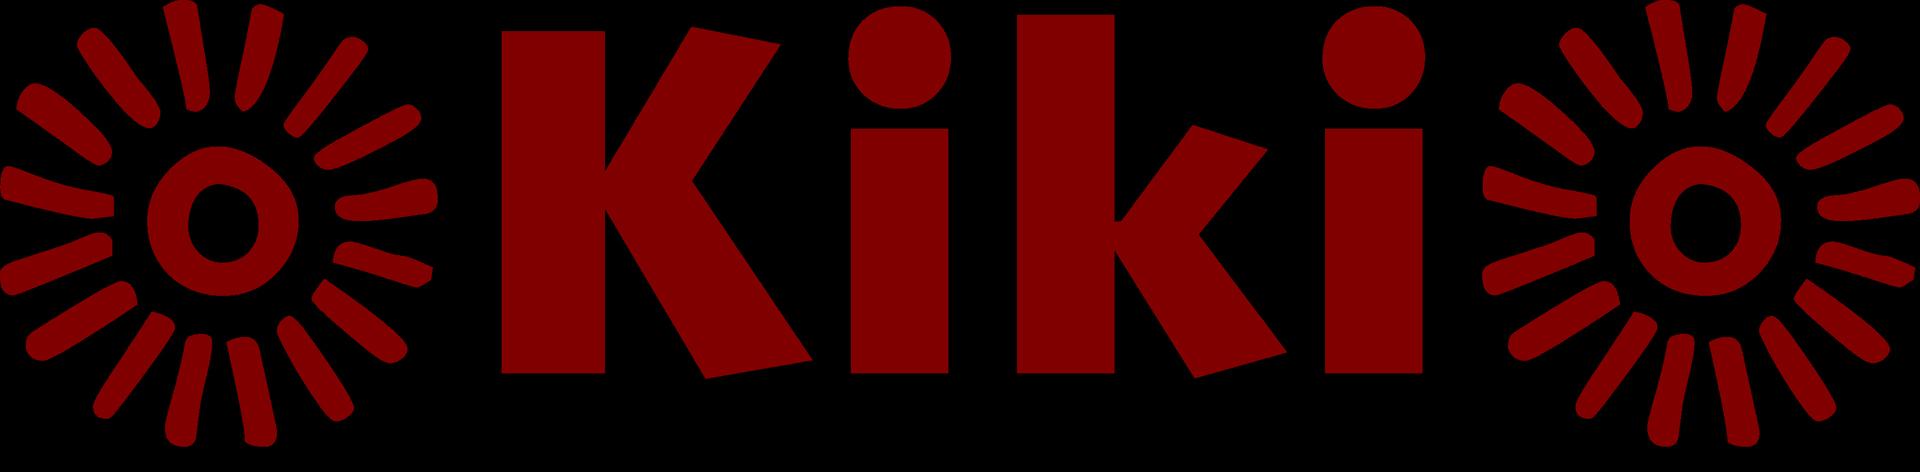 ©ISEA2015: 21st International Symposium on Electronic Art, Michael Krzyzaniak and Prof. Garth Paine, Kiki